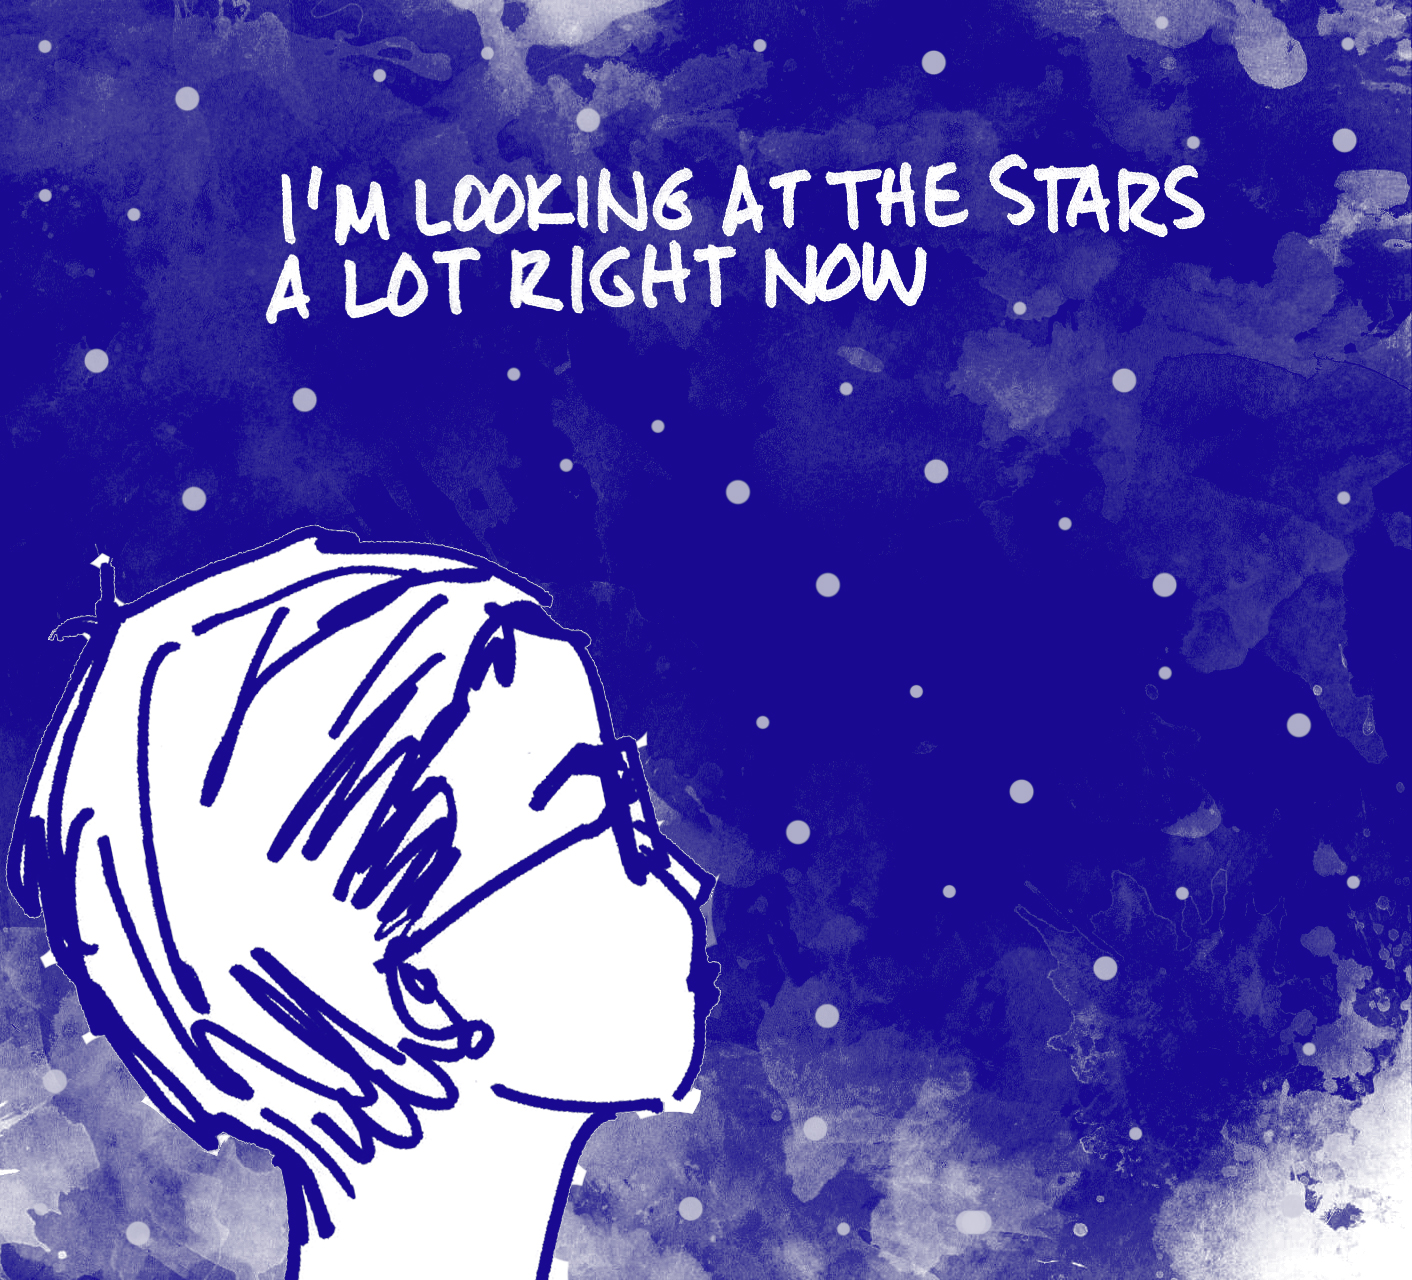 Comic by Alison Garwood-Jones inspired by Chris Hadfield